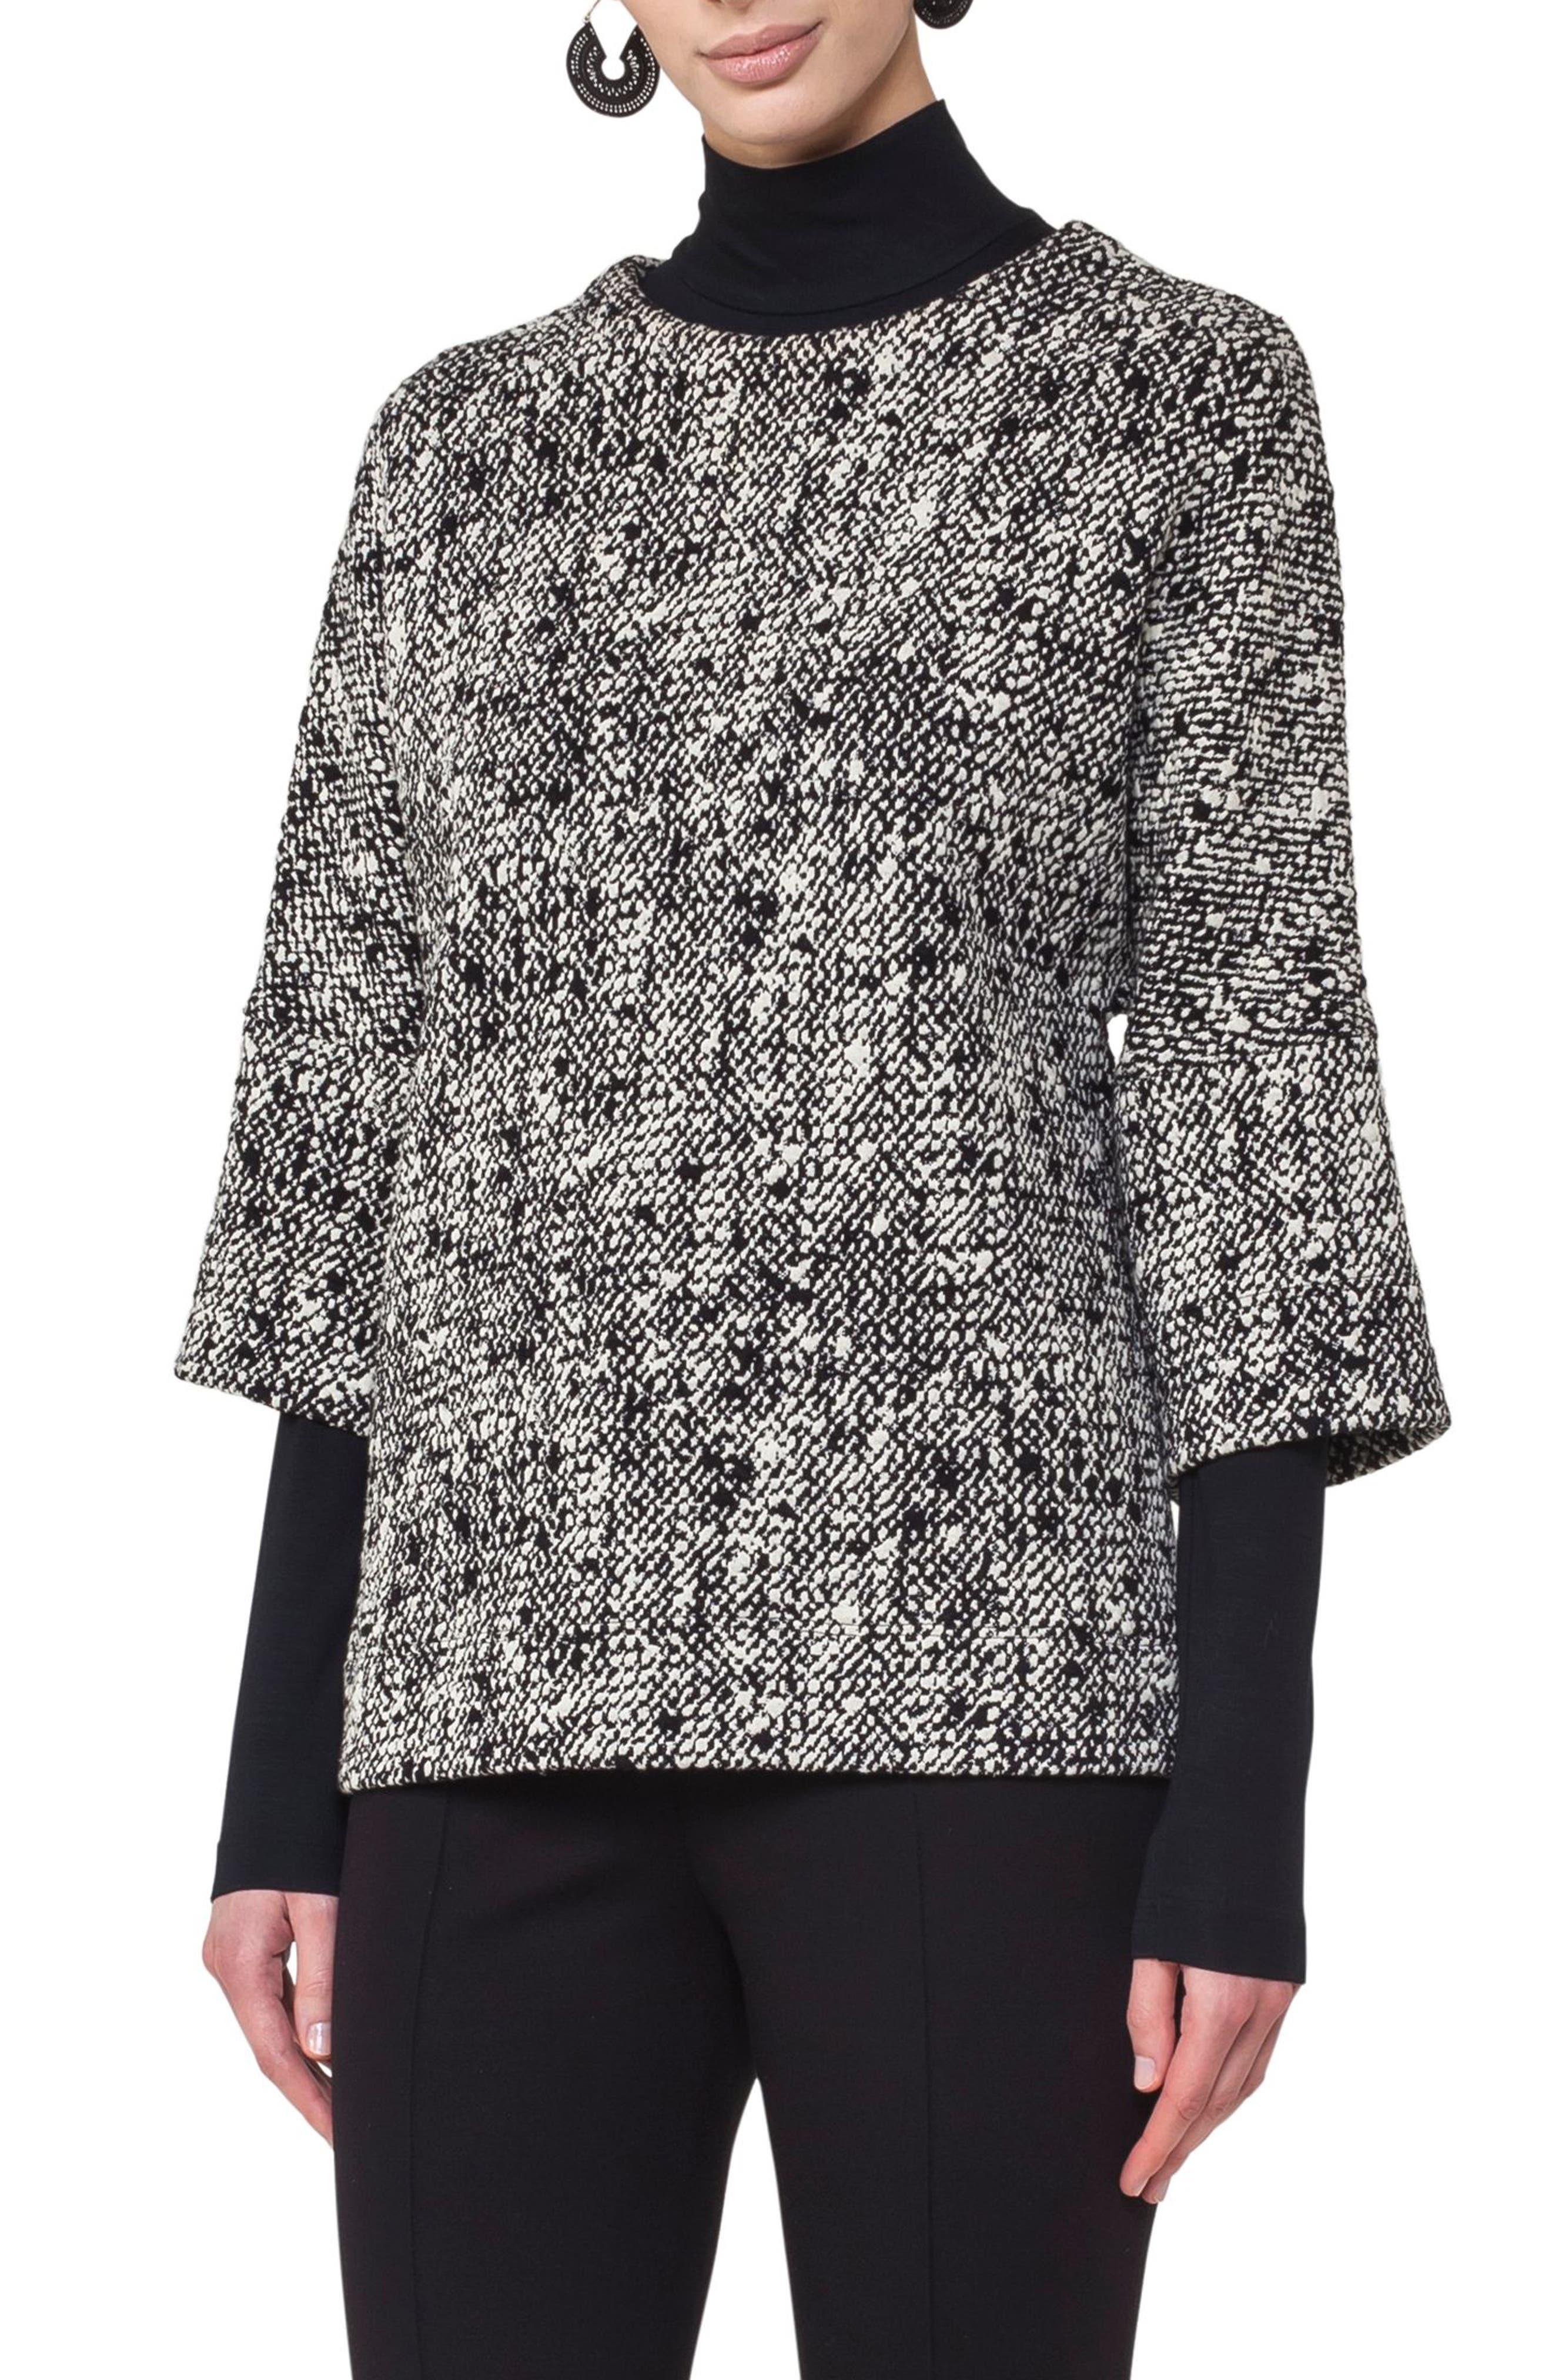 Main Image - Akris punto Cotton Blend Sweater